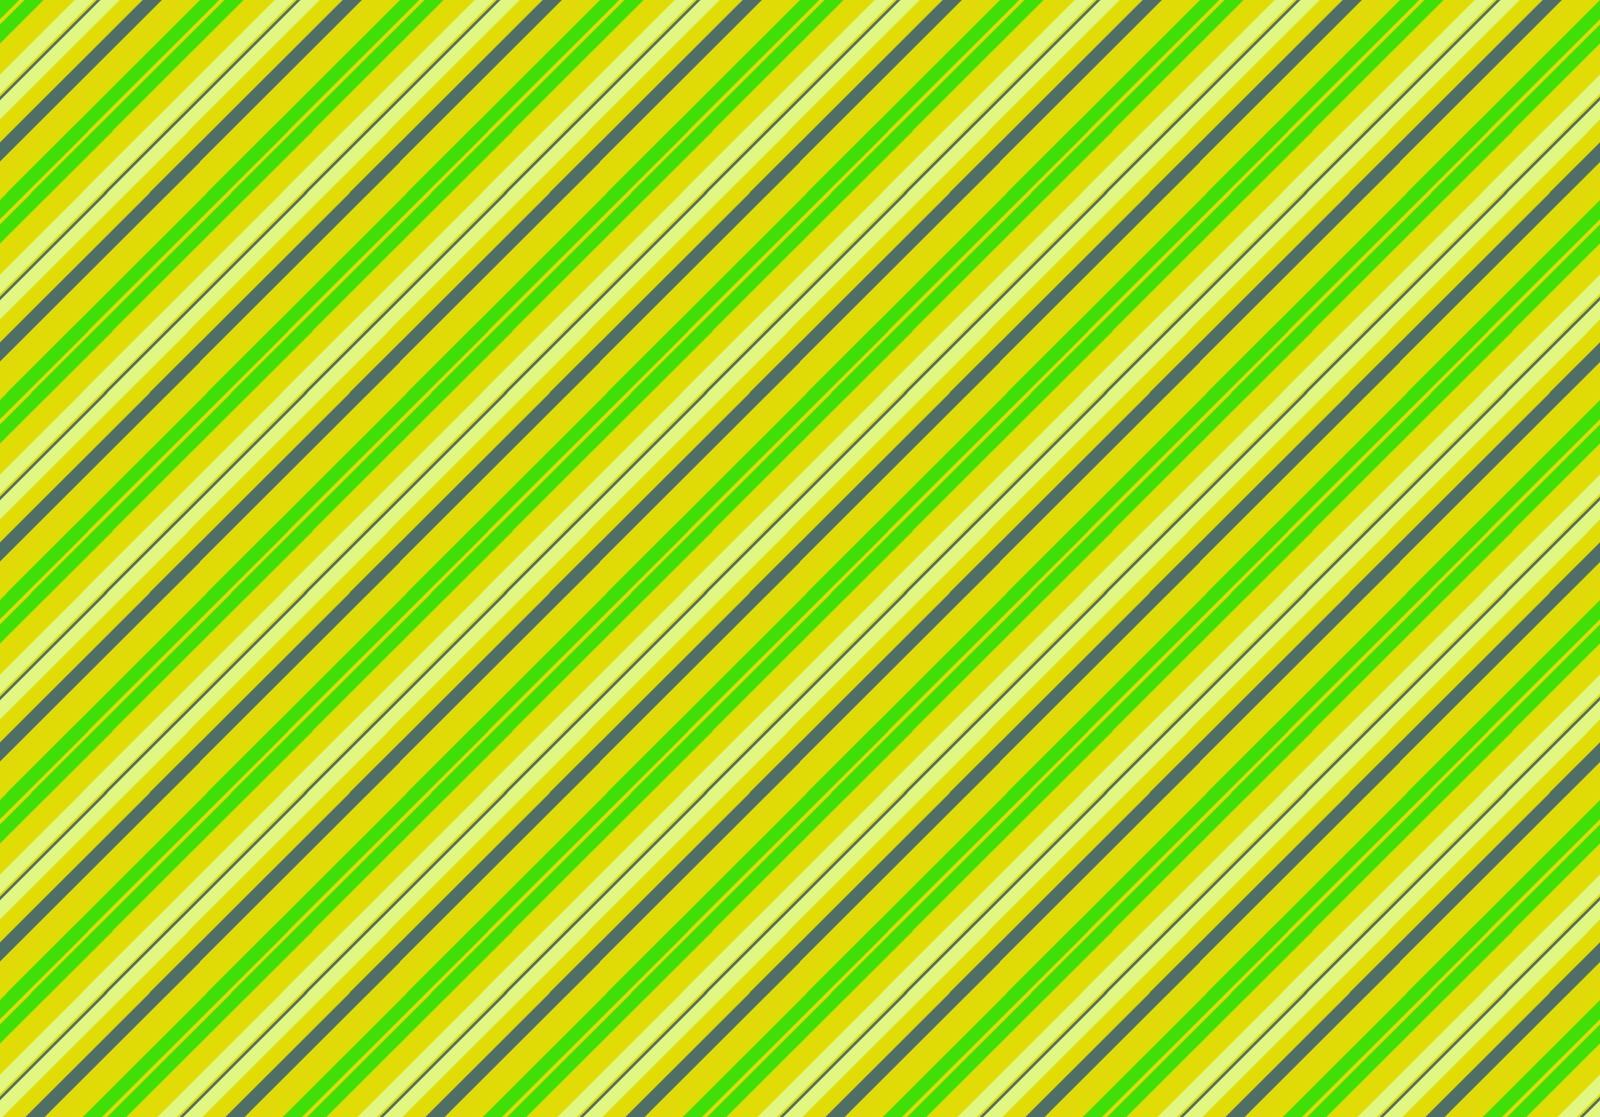 http://3.bp.blogspot.com/-CdRPcaW8__E/UxISl9ctfBI/AAAAAAAASIM/2EIo8Nc-25g/s1600/COLOURlovers.com-Stripes.jpg